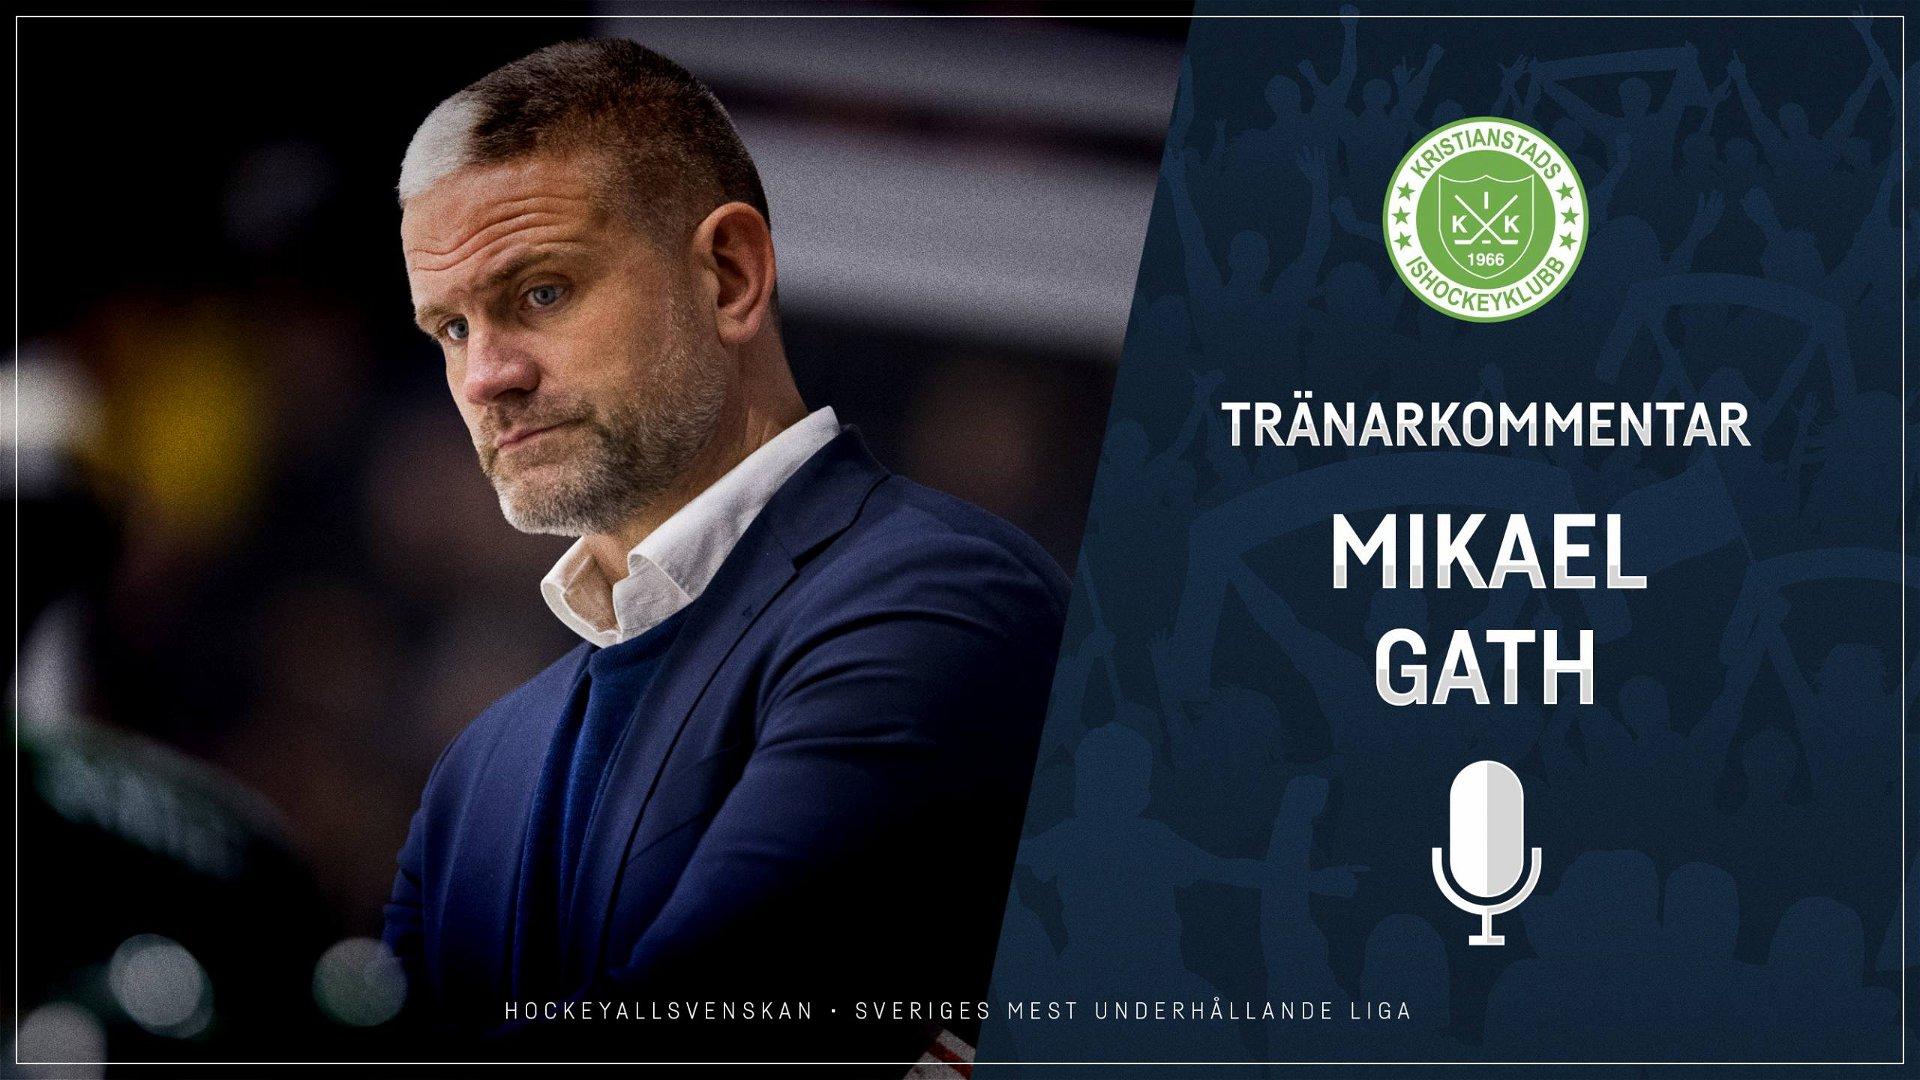 2021-03-07 Segerintervju: Mikael Gath